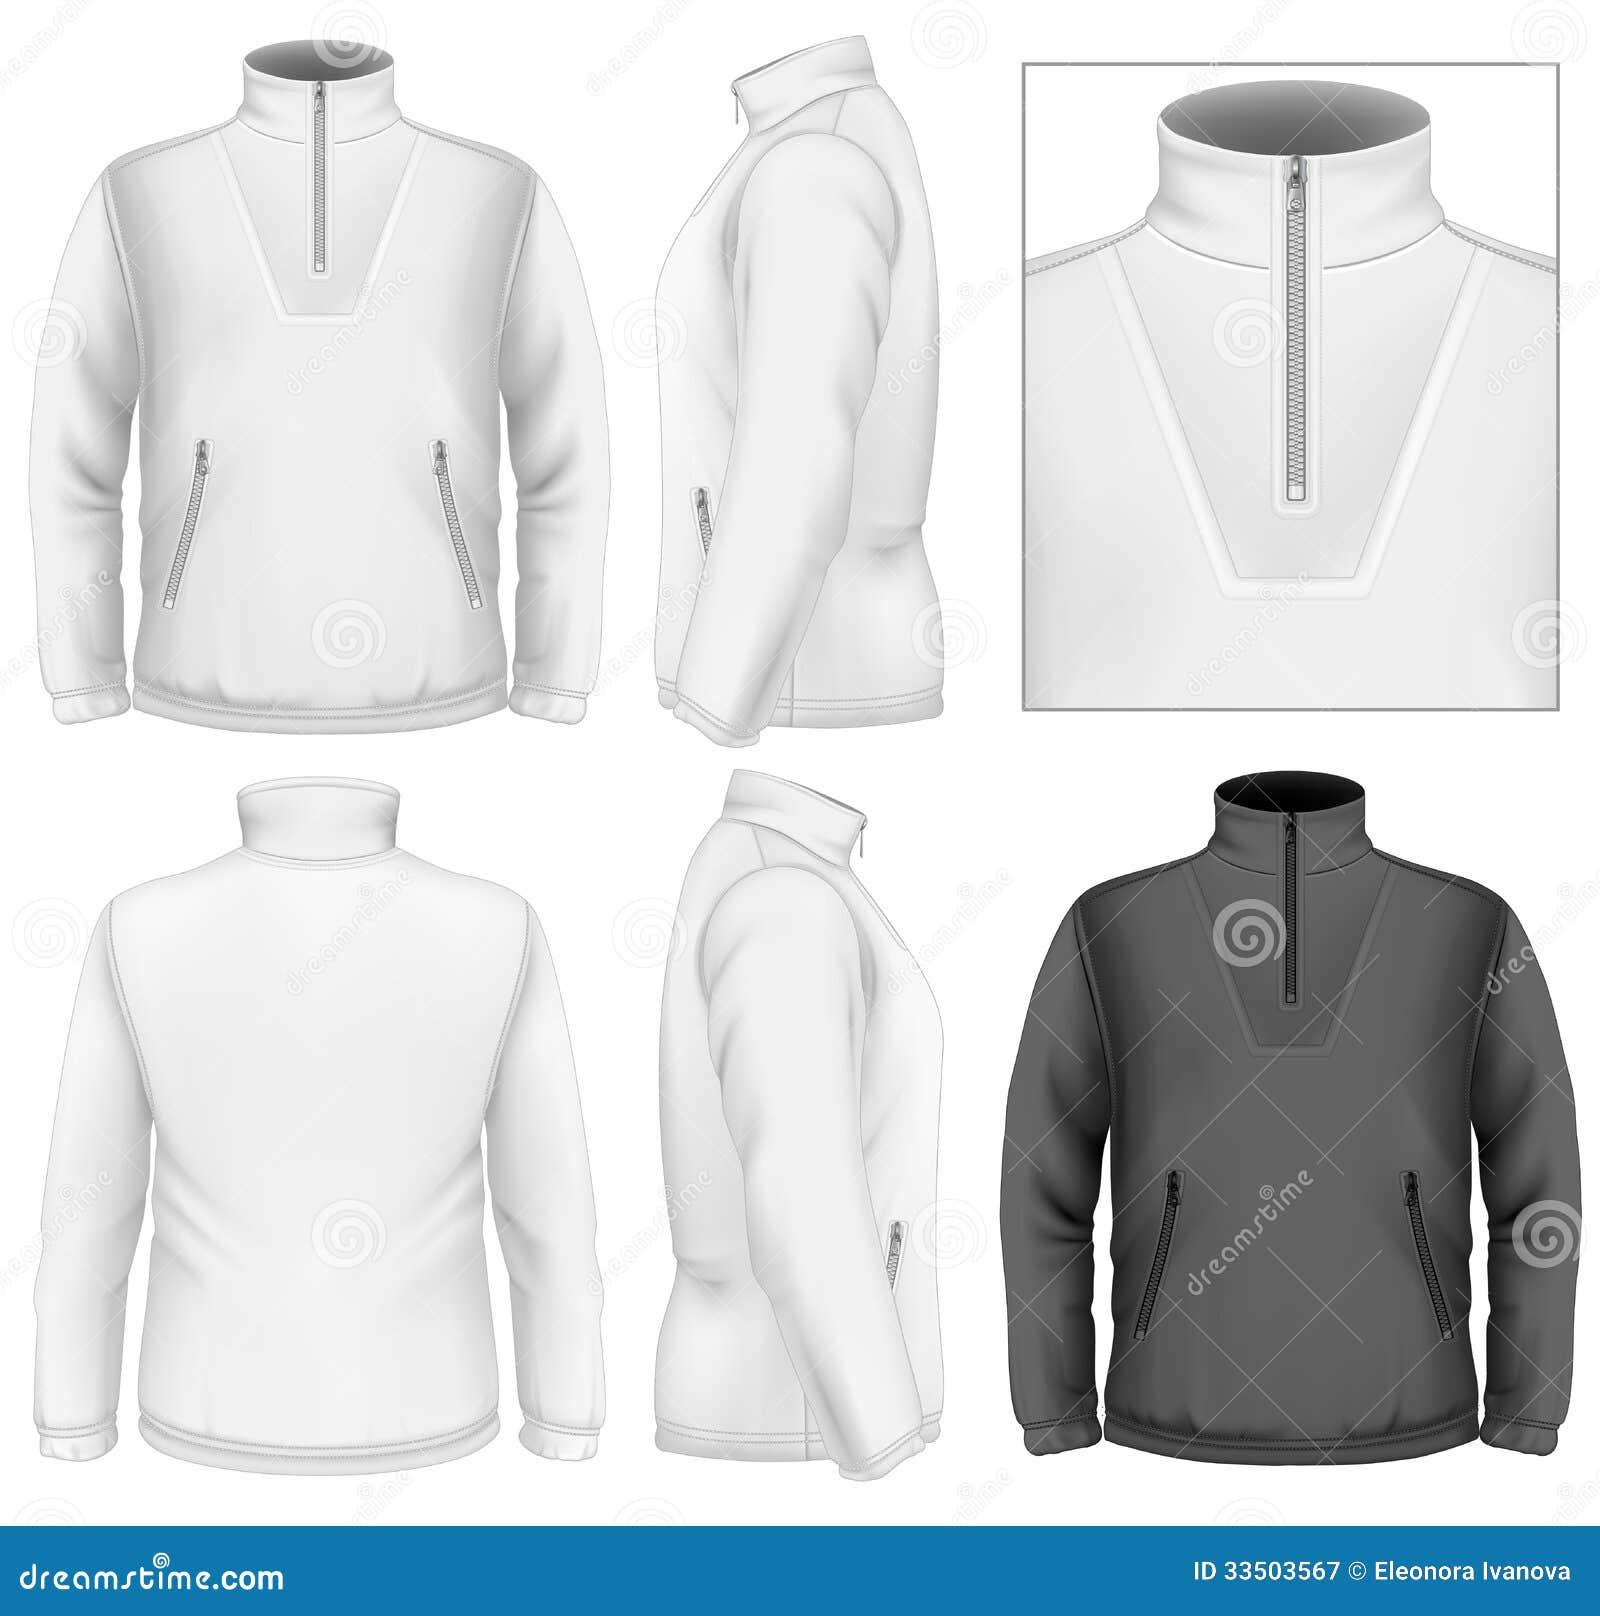 Mens Long Sleeve Shirt With Pocket